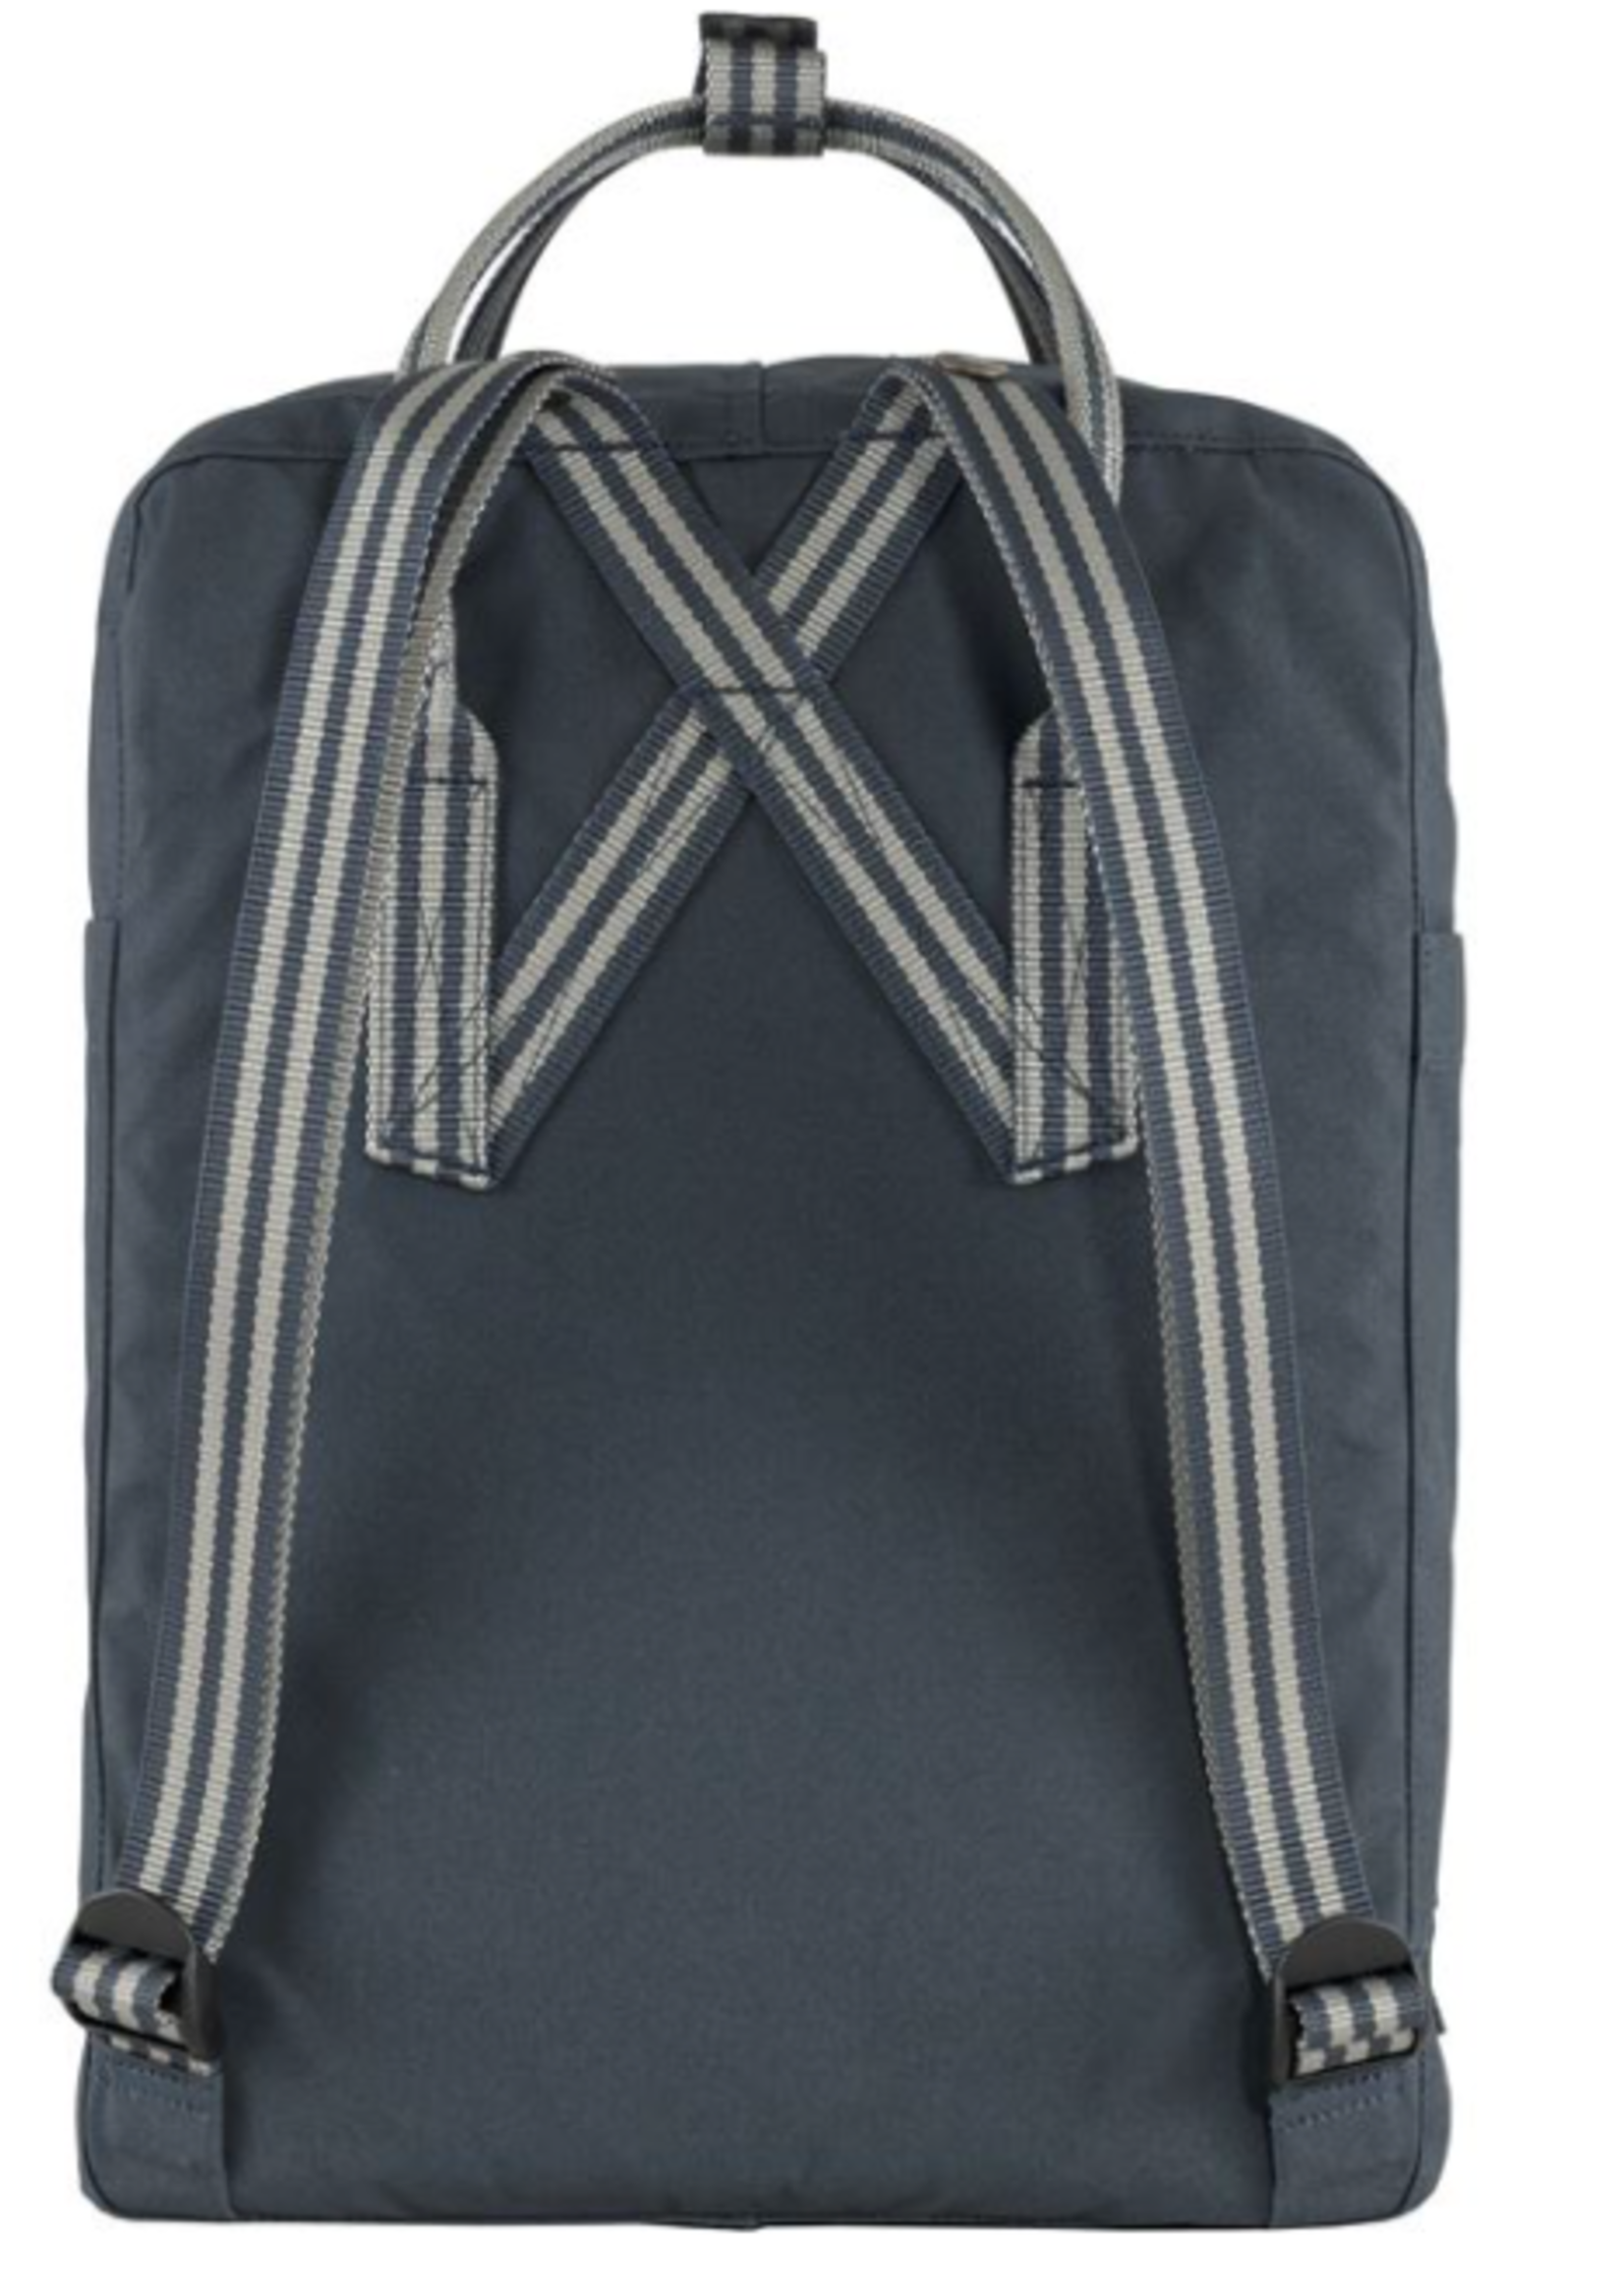 FJALL RAVEN Kanken Backpack NAVY-LONG STRPIES